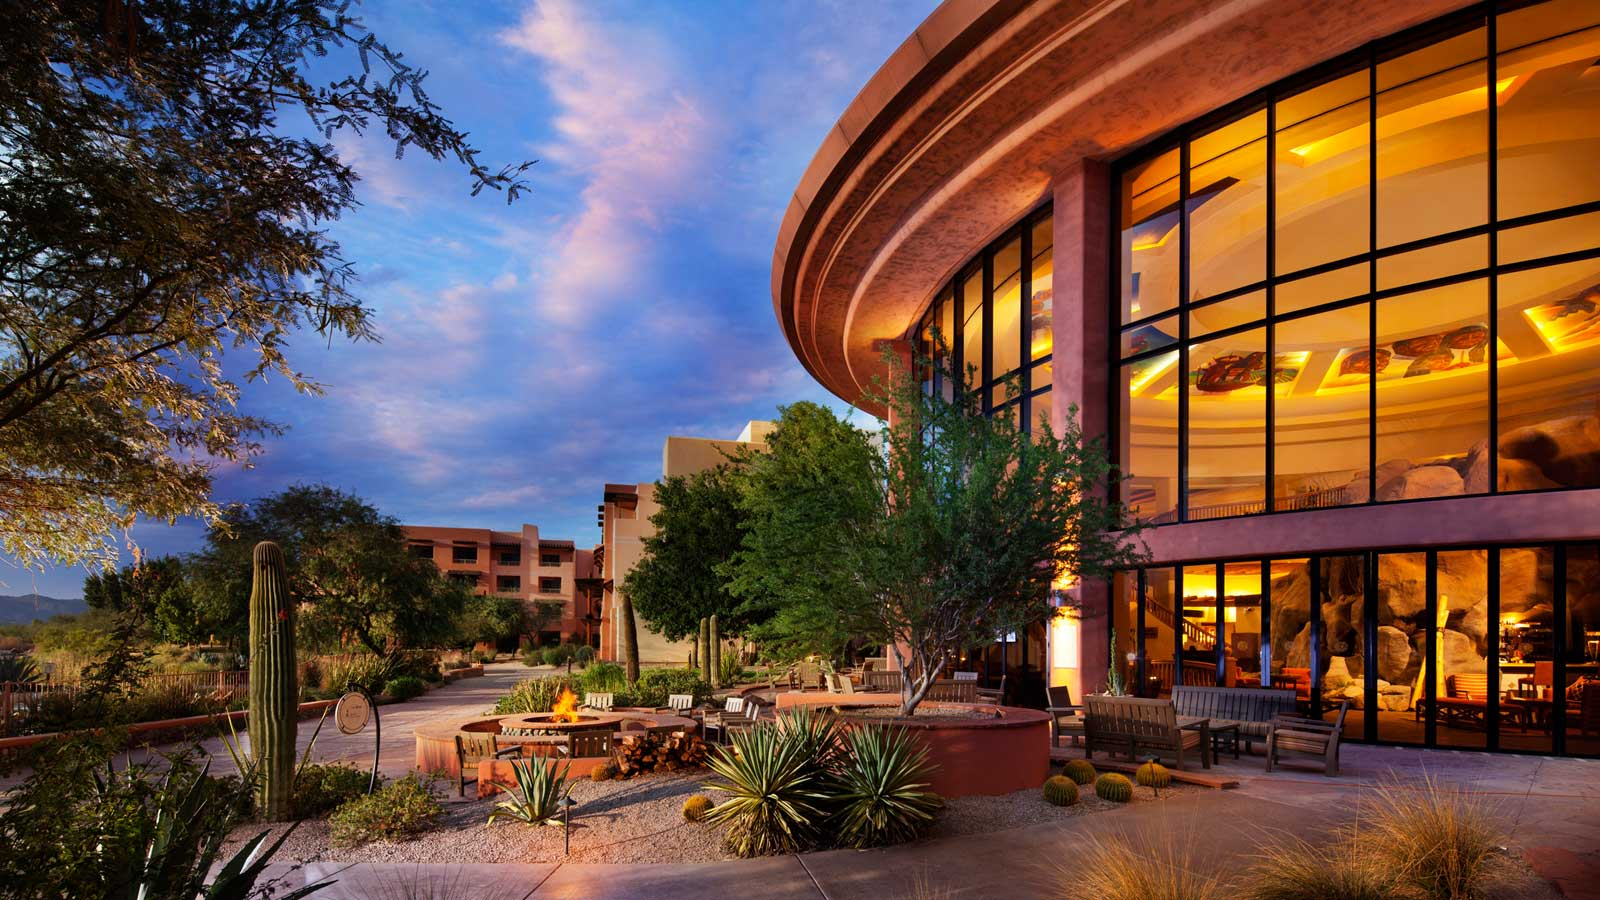 Santa Rosa Spa Resort